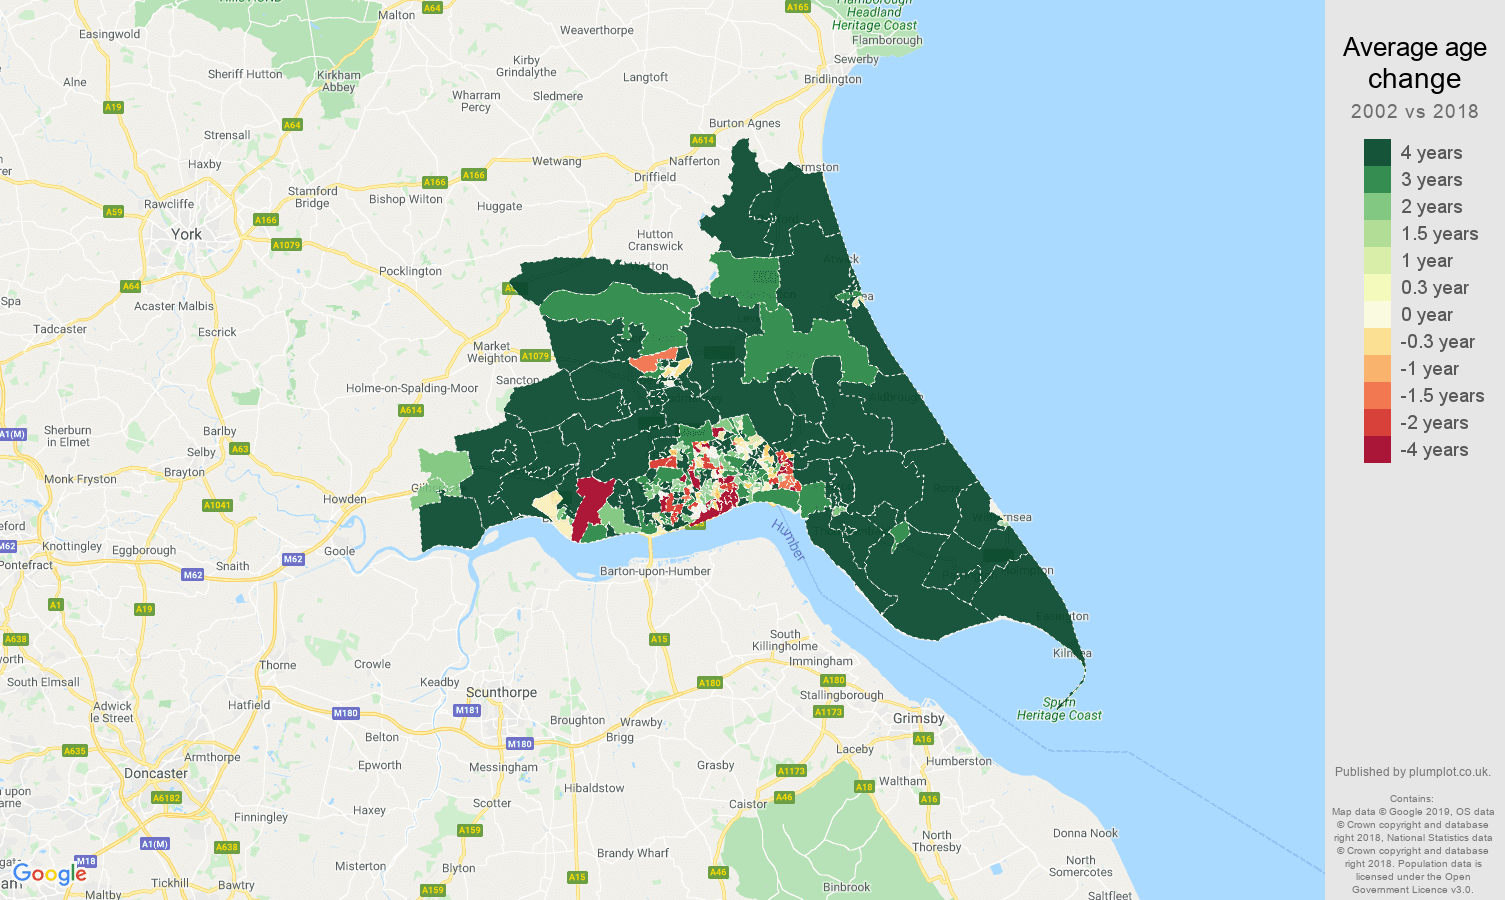 Hull average age change map